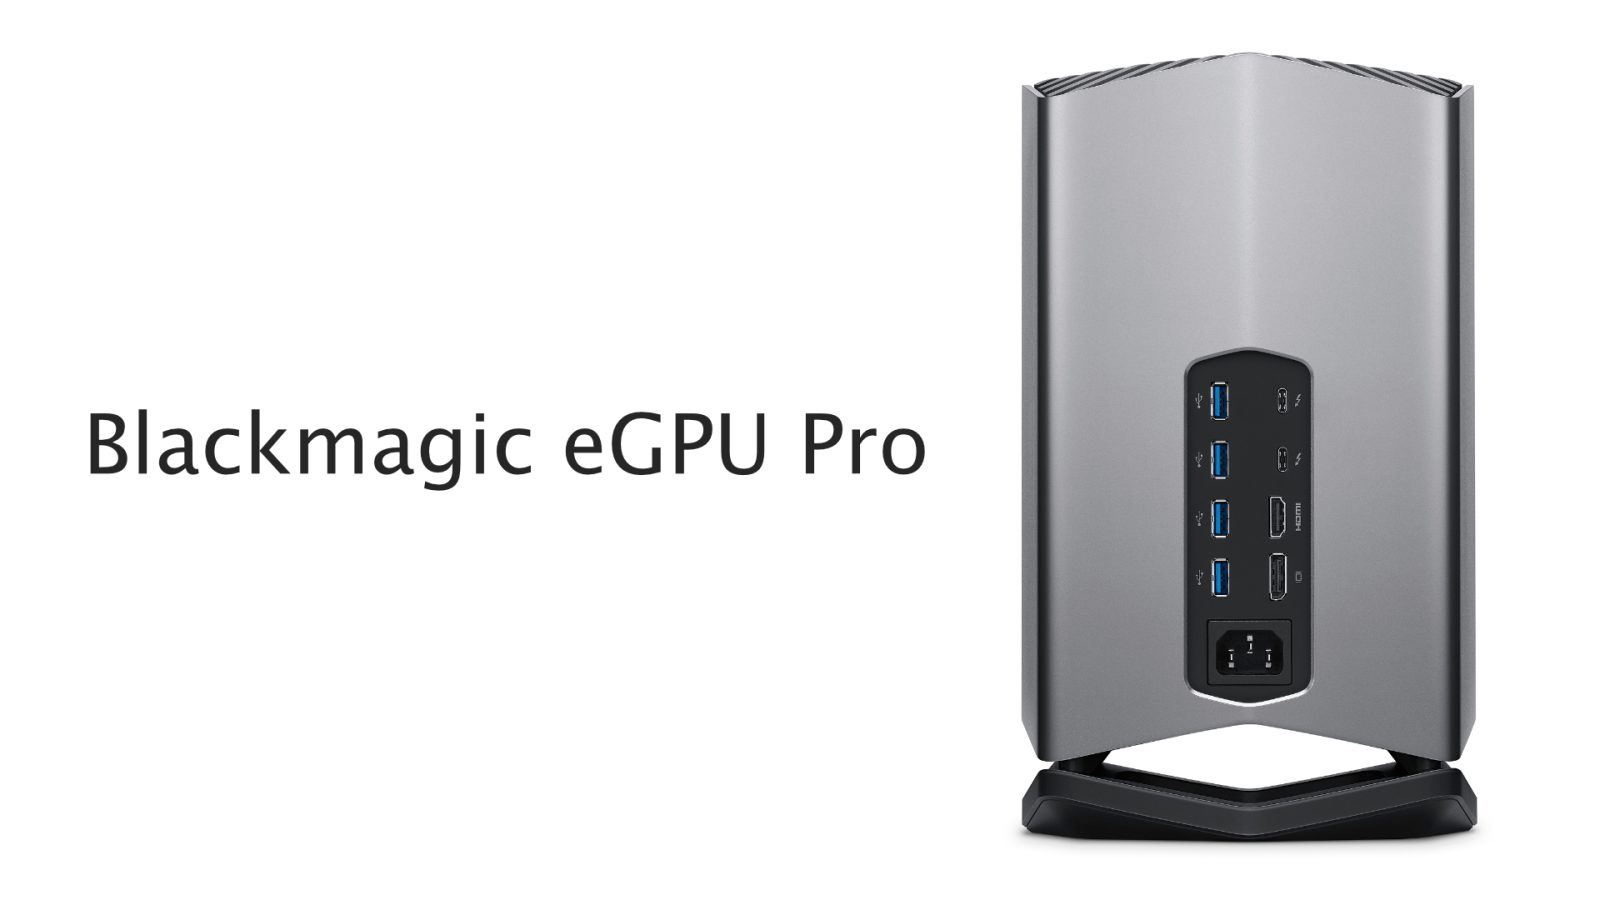 Blackmagic-eGPU-Pro